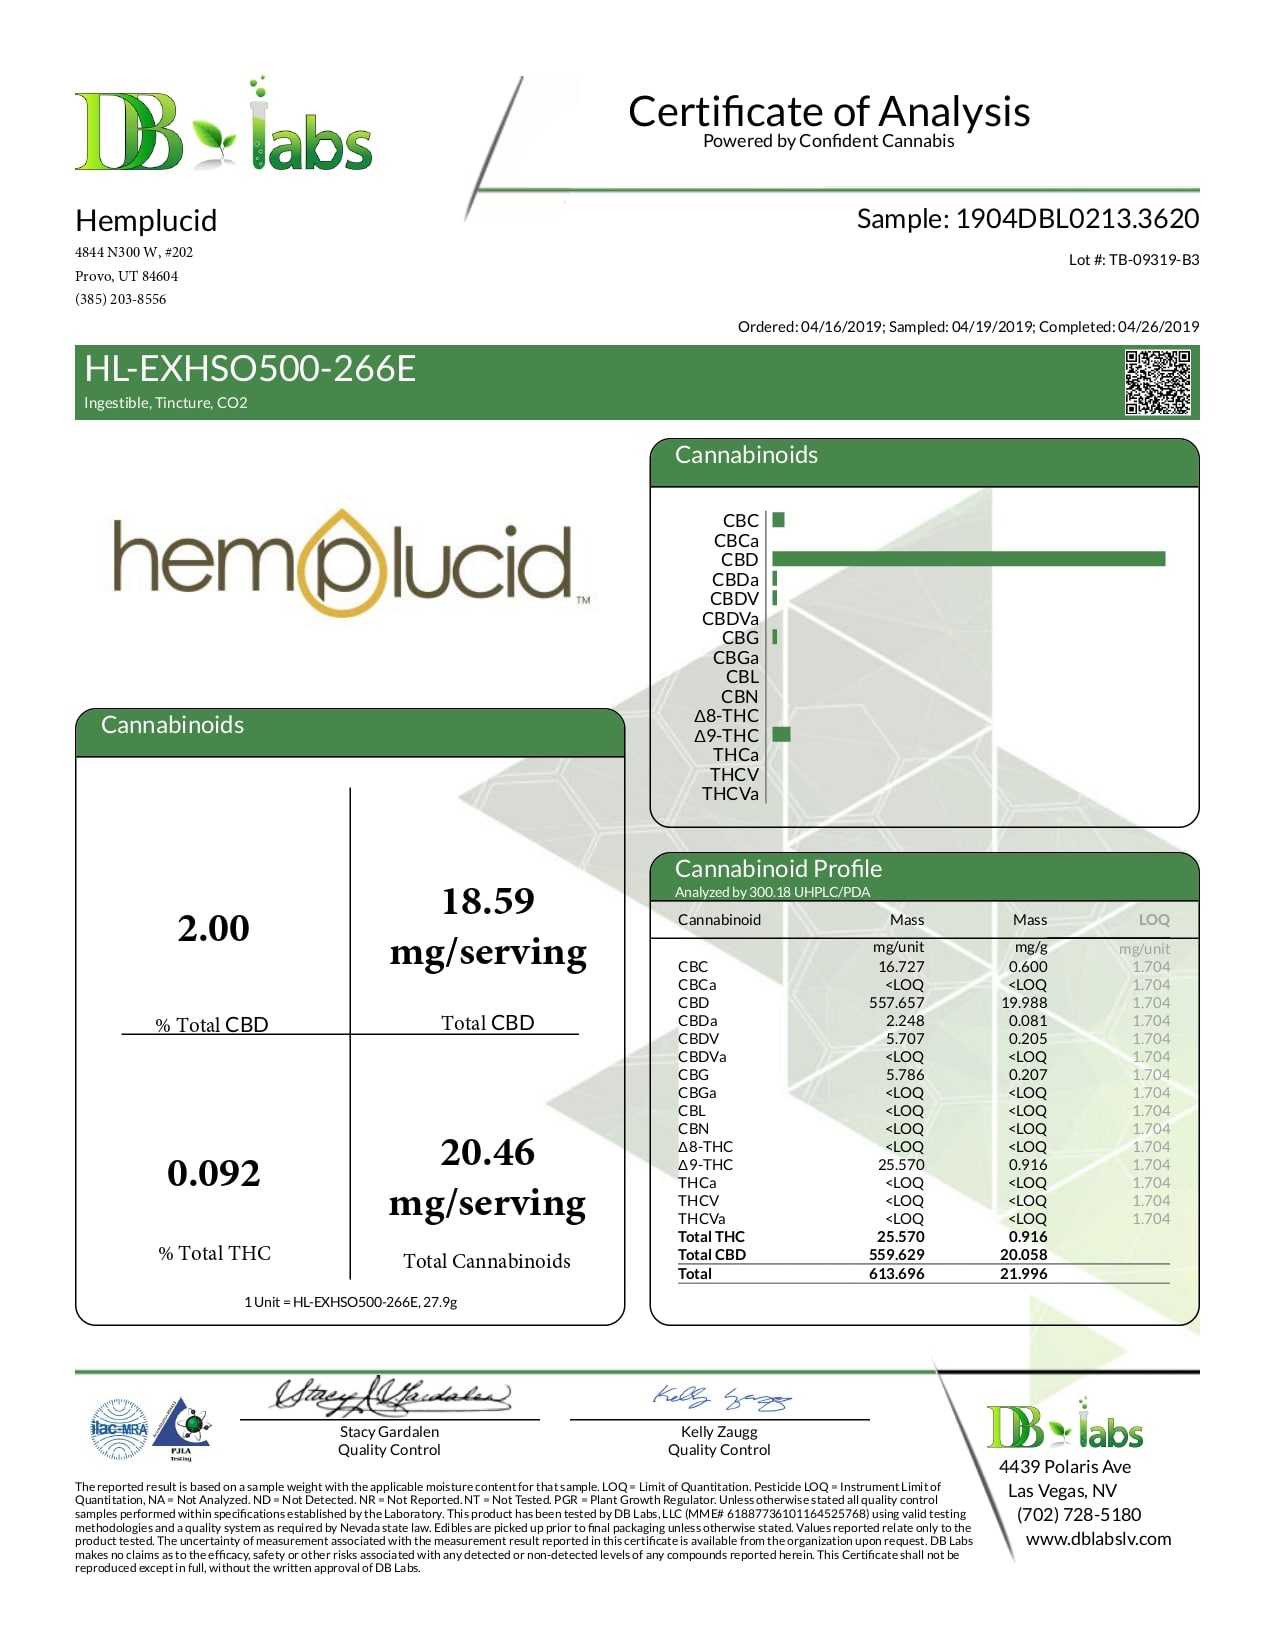 Hemplucid Full Spectrum CBD Hemp Seed Oil 500mg Lab Report